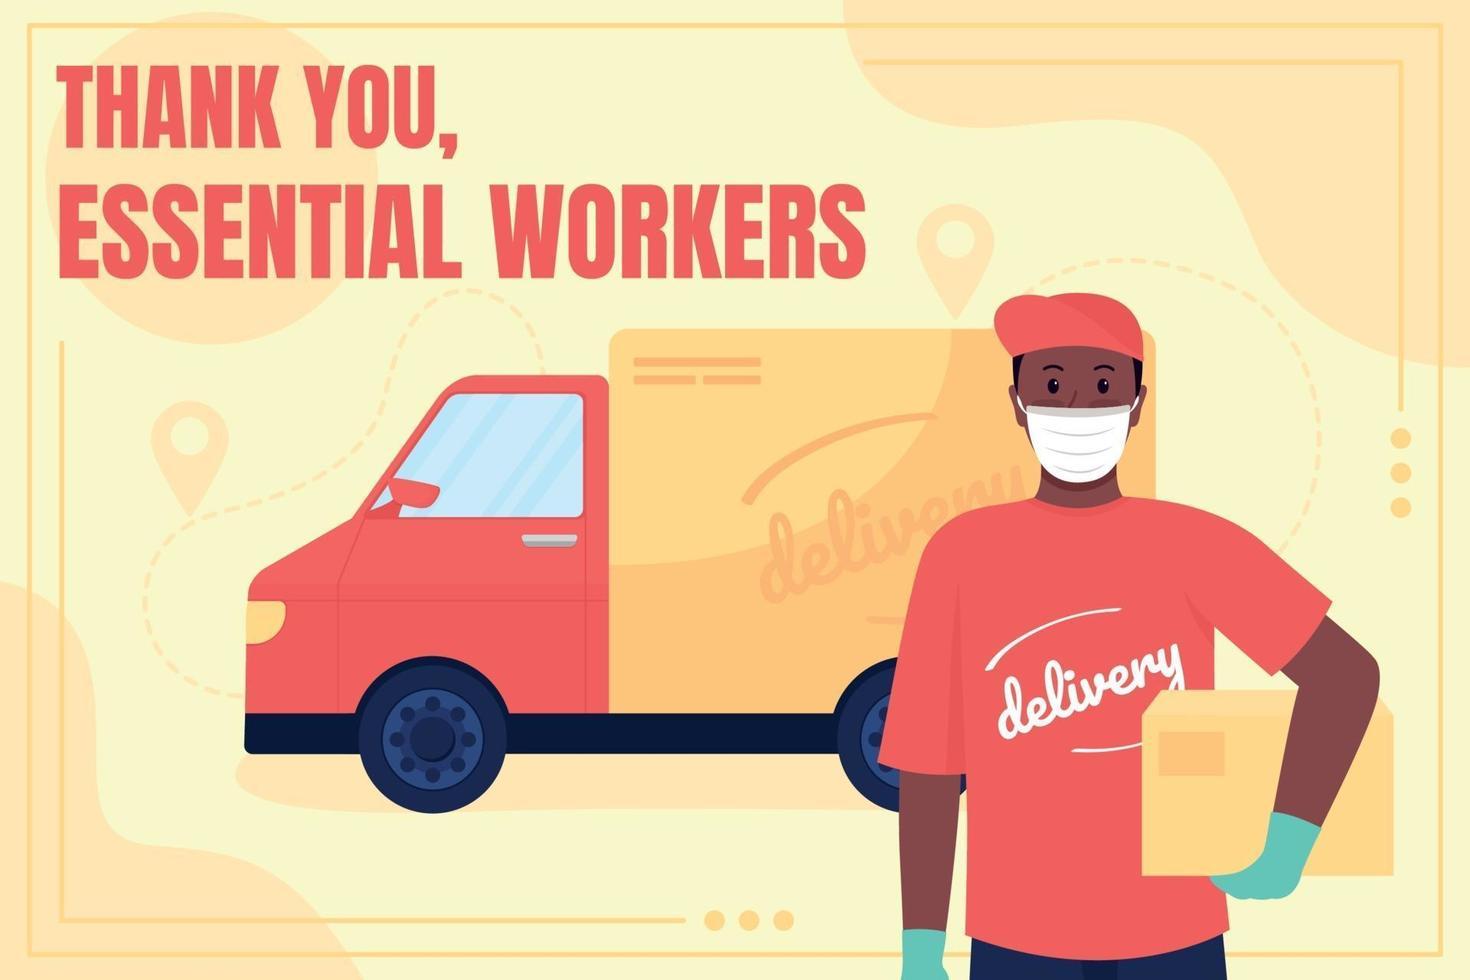 Delivery service worker social media post mockup vector